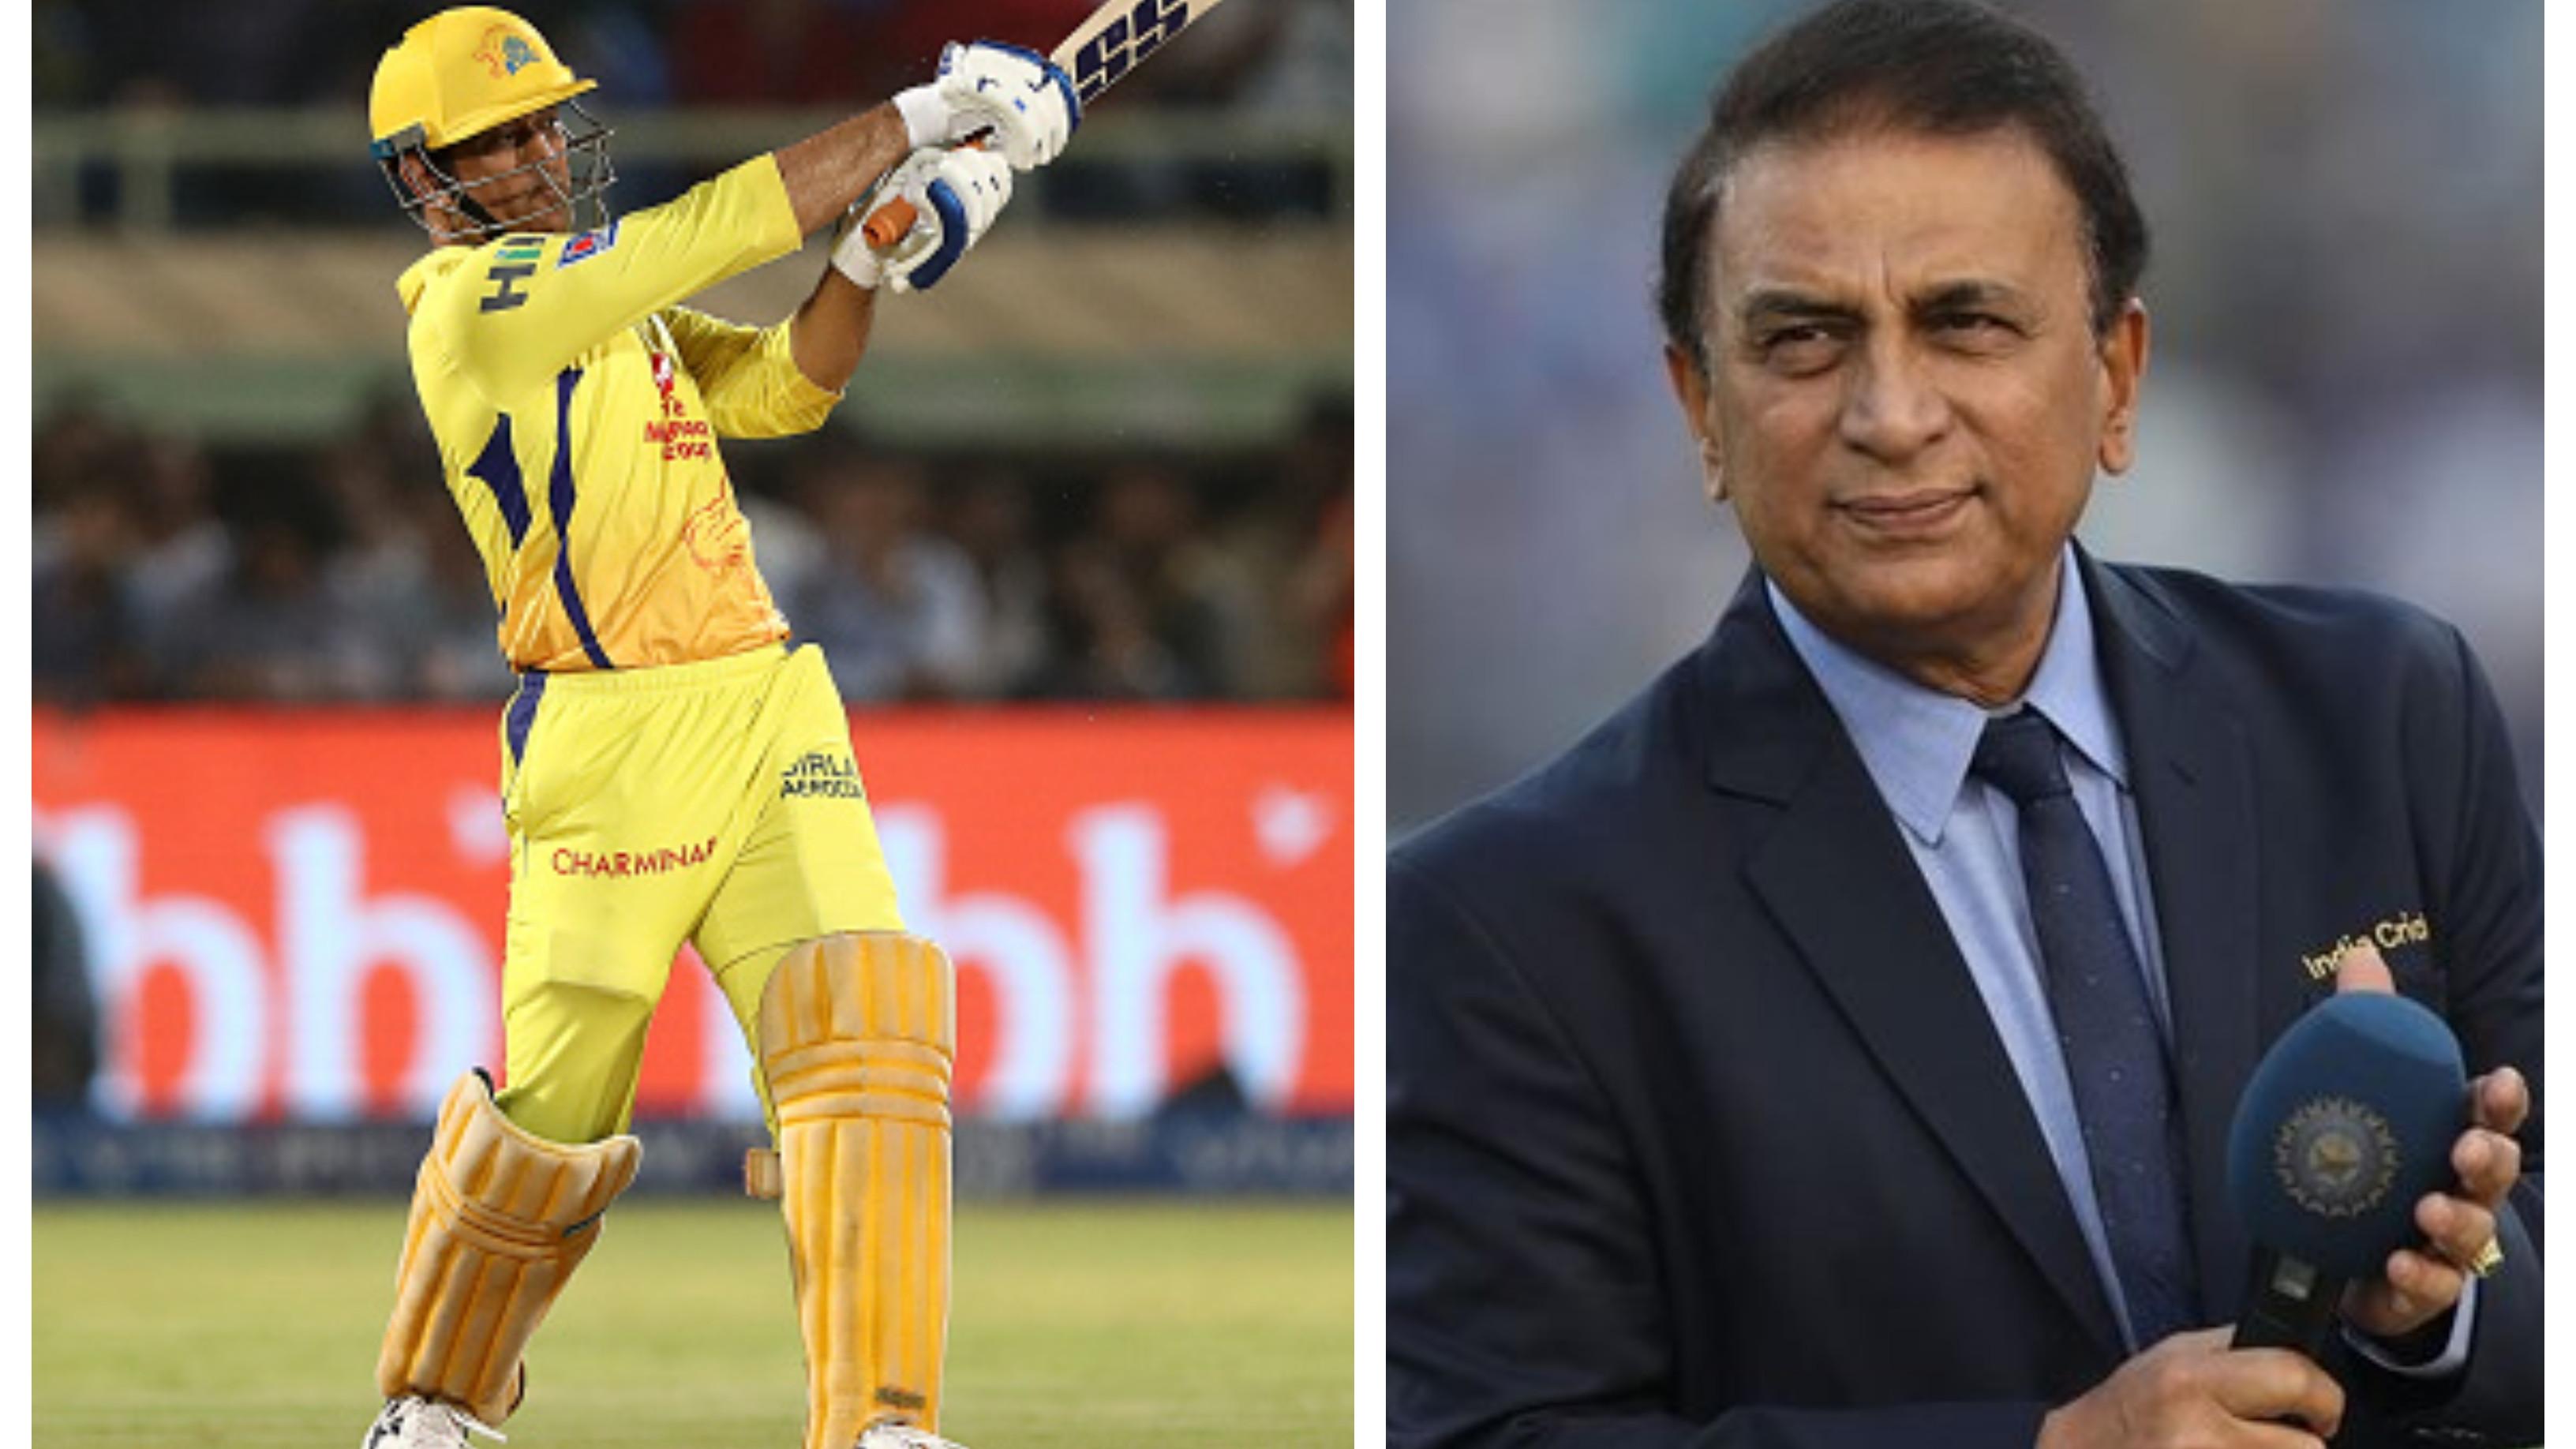 IPL 2021: Sunil Gavaskar names MS Dhoni as captain in his all-time IPLXI